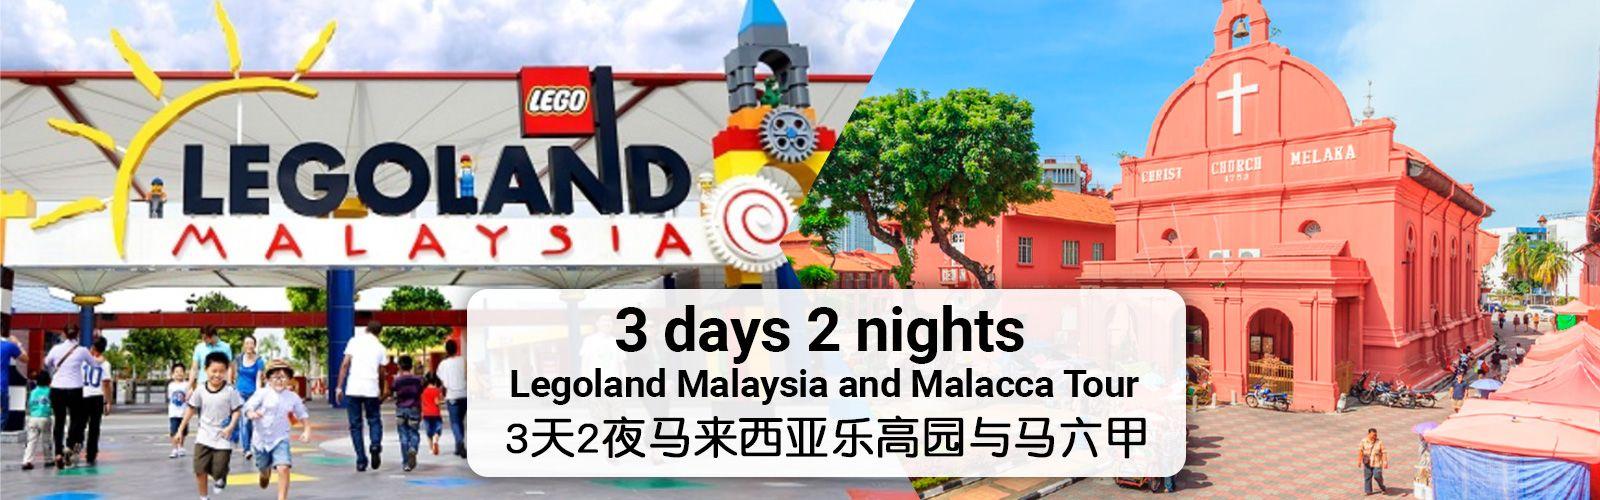 3 days 2 nights Legoland Malaysia and Malacca Tour